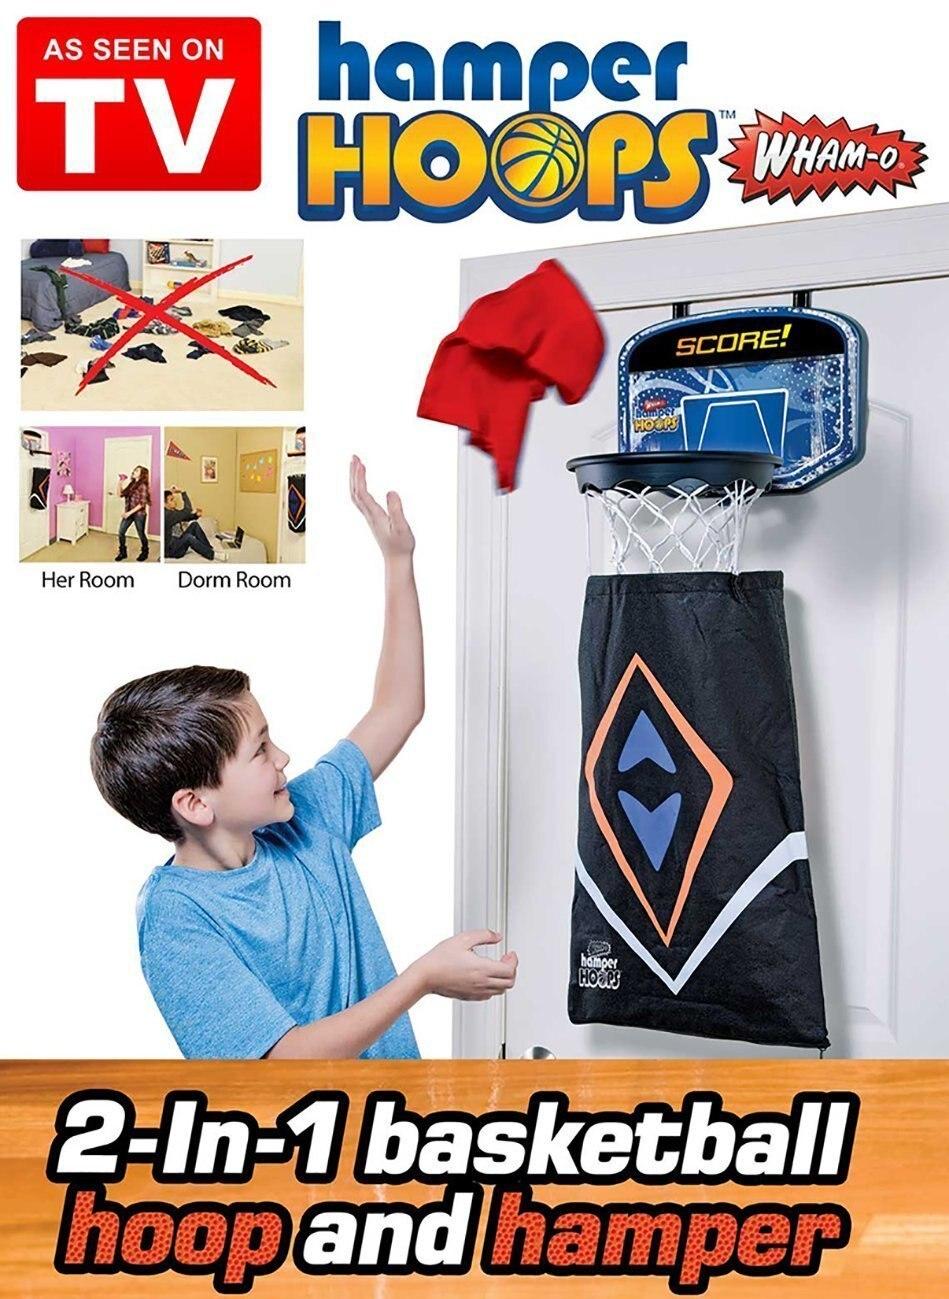 2PCS Hamper Hoops 2in1 Over-The-Door Basketball Backboard Hoop And Hamper With Detachable Dirty Laundry Bag for Kids Children